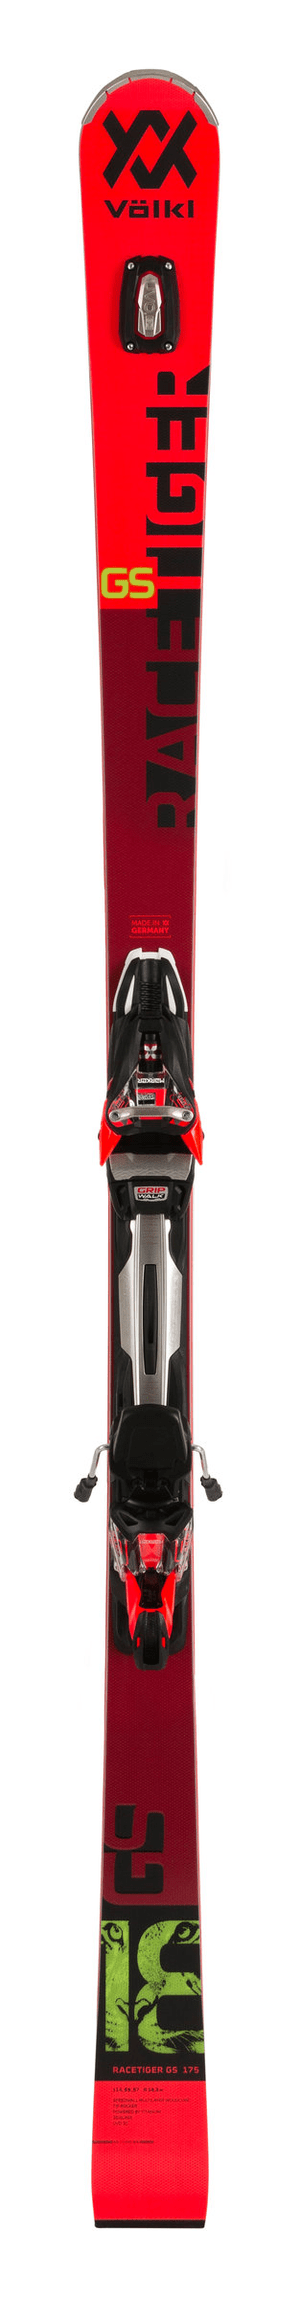 Racetiger GS inkl. rMotion2 12 GW